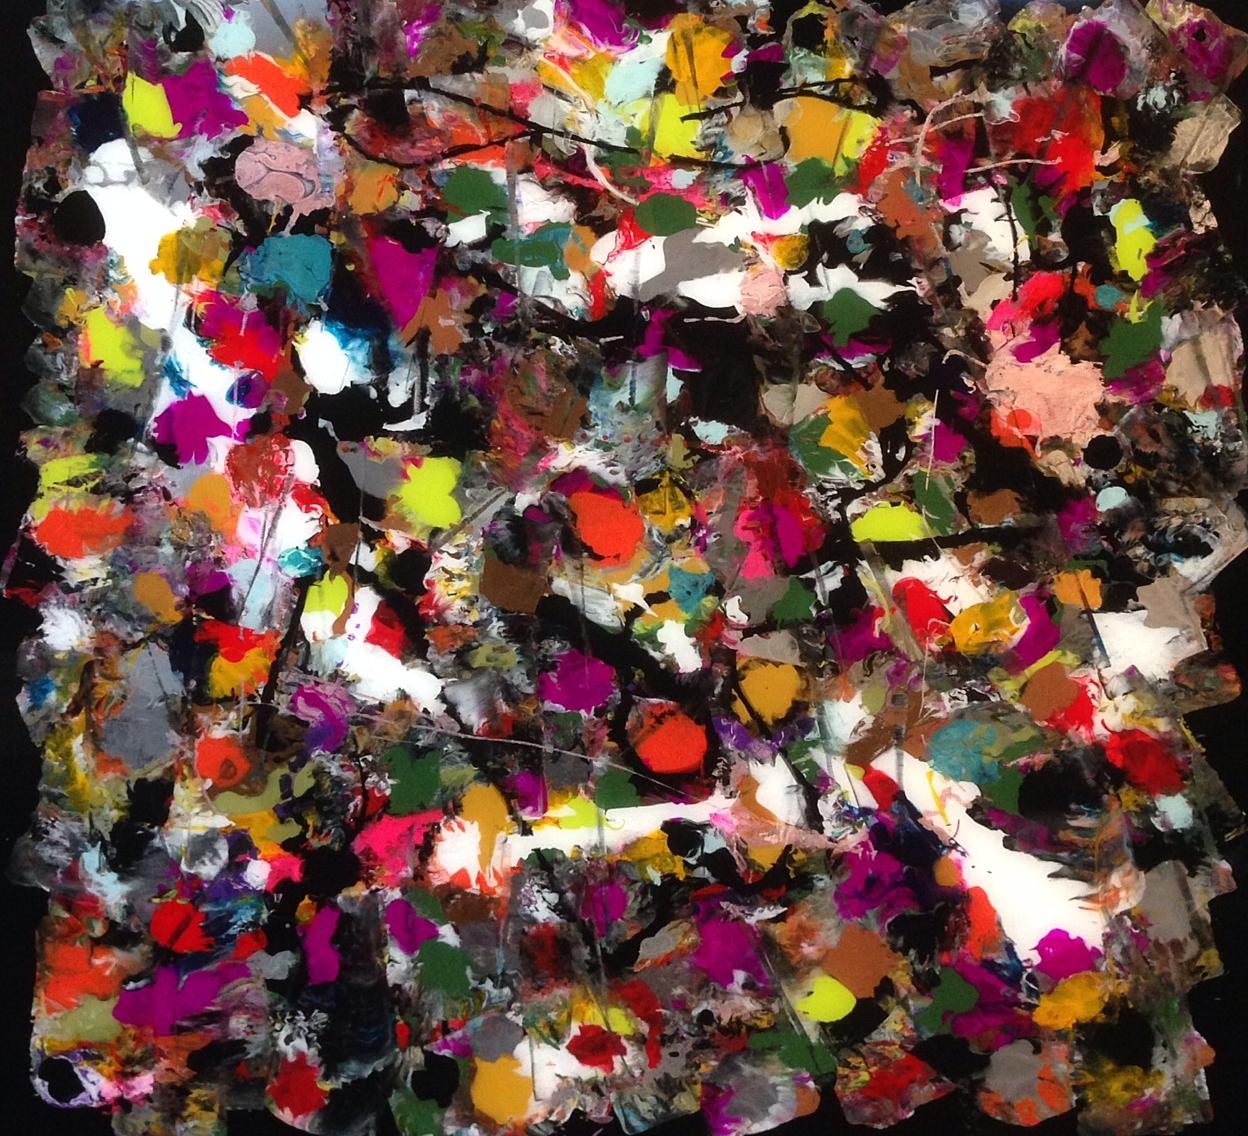 MULTIPLE LIVES, BLACK Reverse painting on plexiglass,30 x 36 in .91 x 76 cm